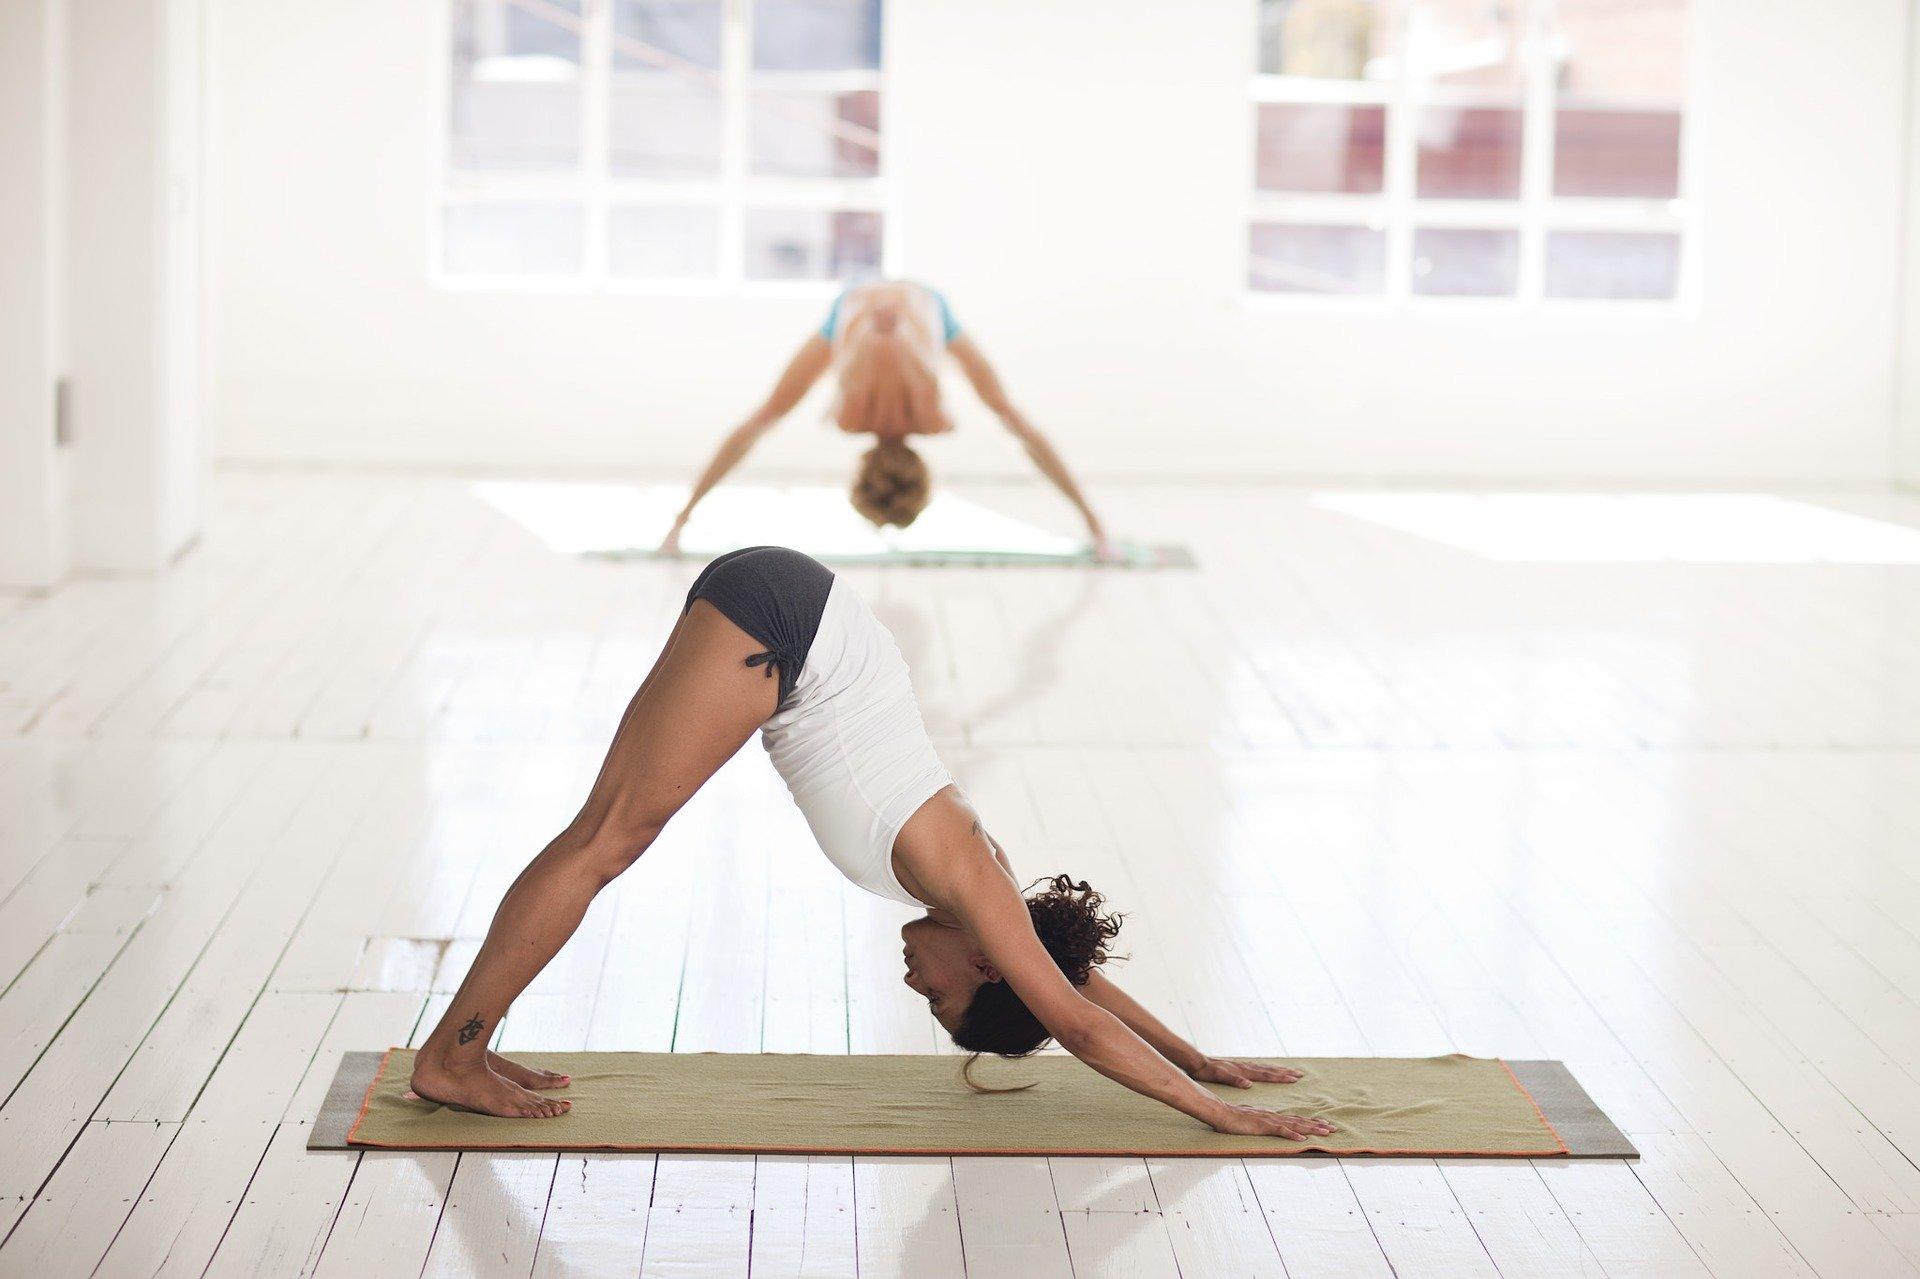 yoga domain ede kérizel ambon morbihan b